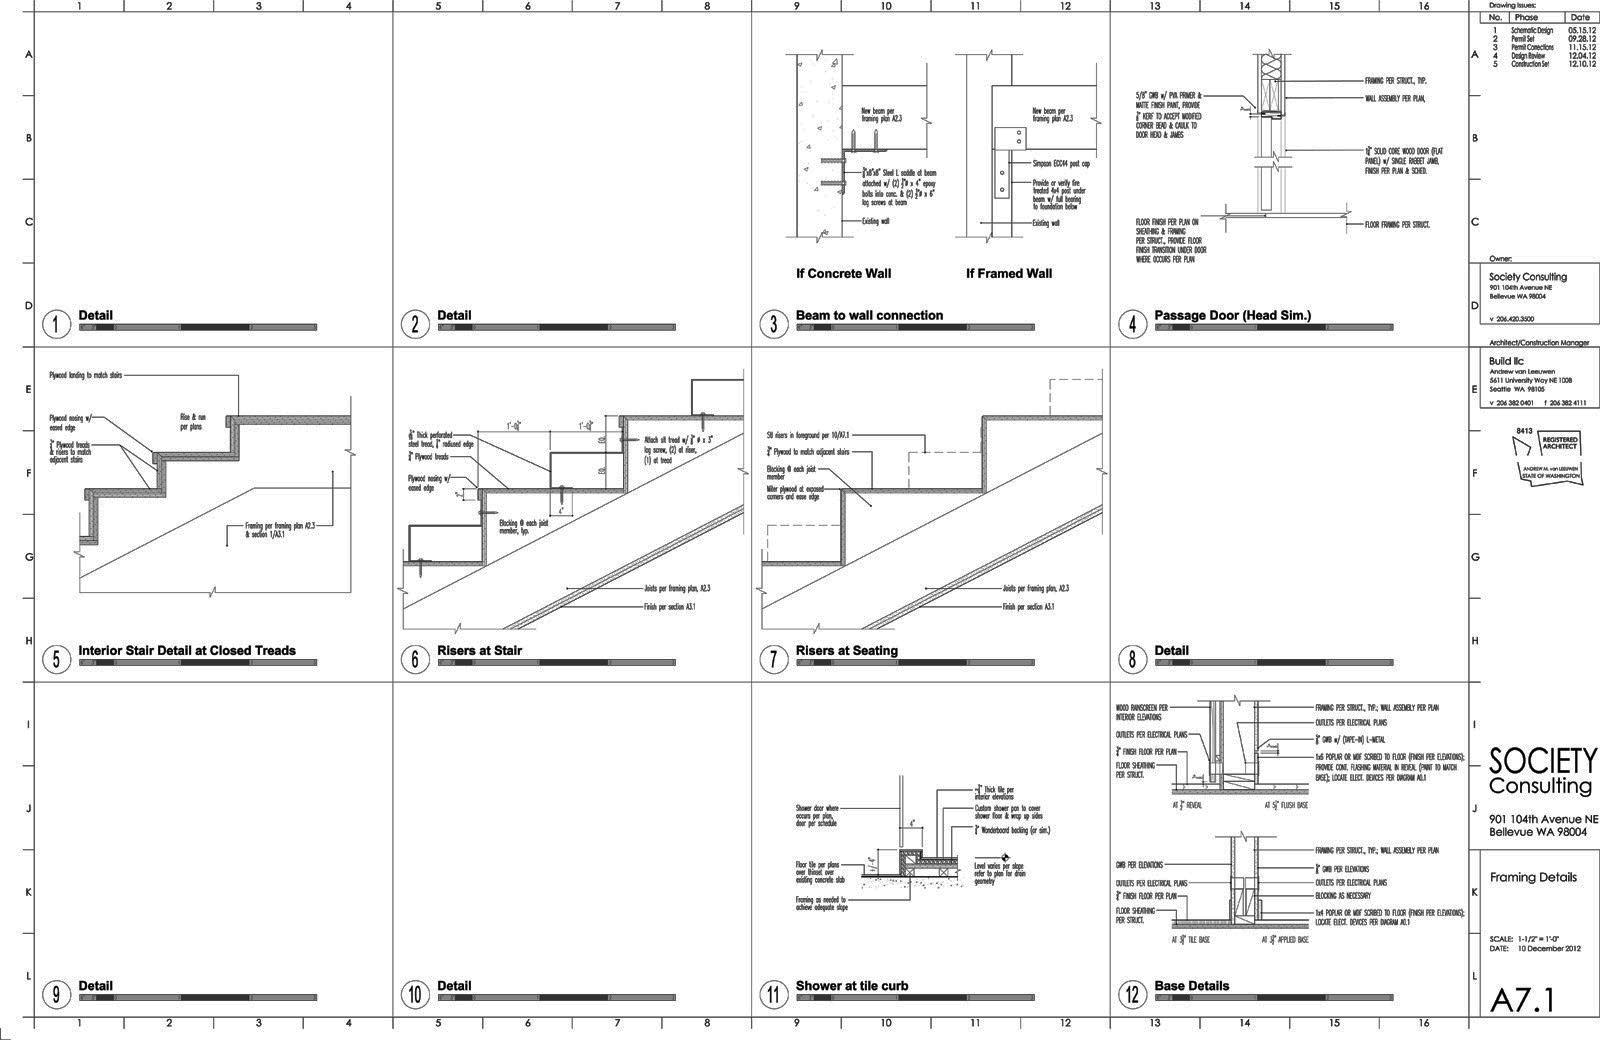 Z:Databuild projectsSocietySociety DrawingsSociety A6-7 A7.